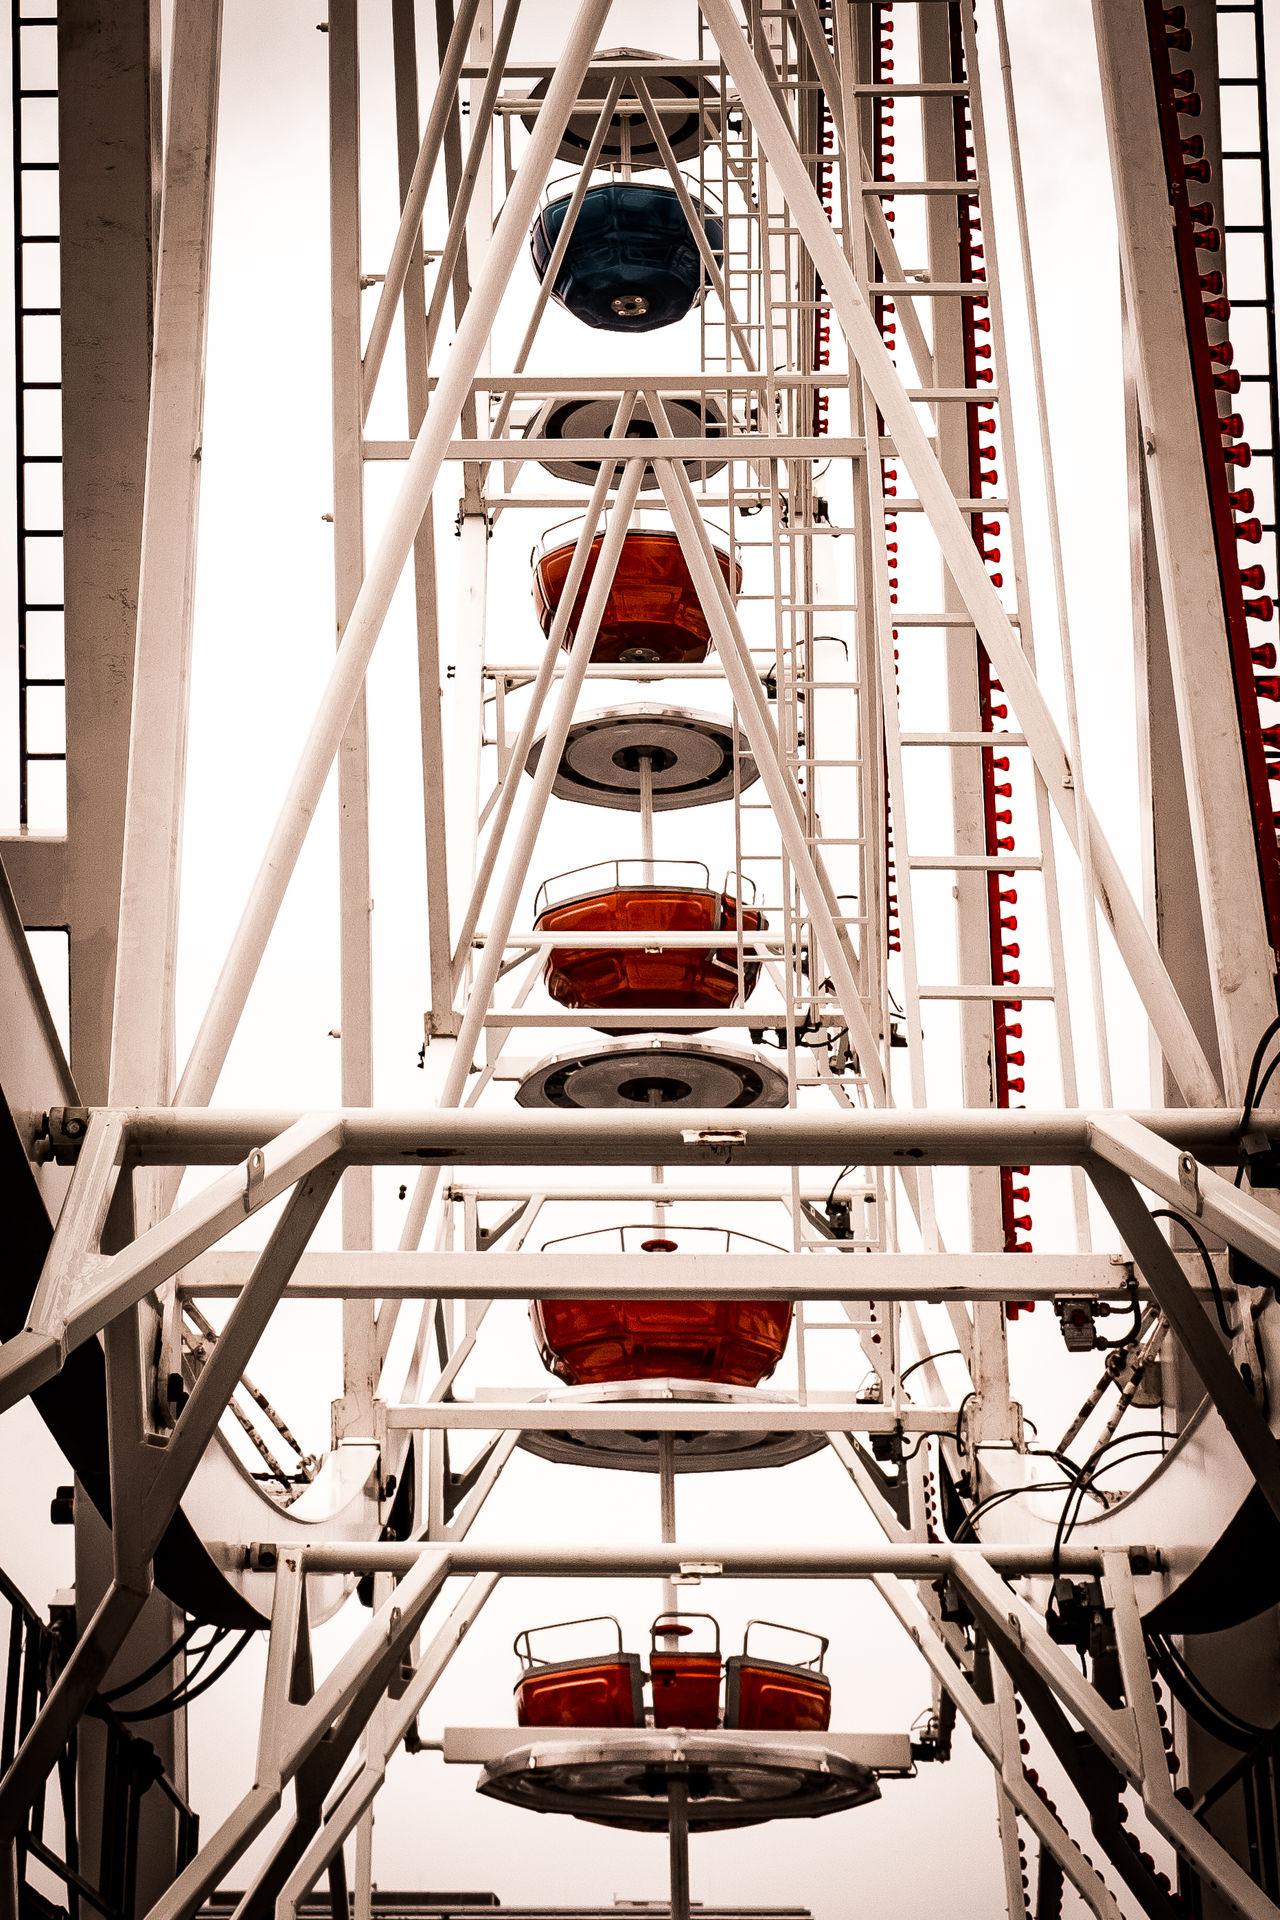 Amusement Park Architecture Big Wheel Built Structure Day Ferris Wheel Fun Fair Fun Fair Ride Industry Kermis Low Angle View Modern No People Technology